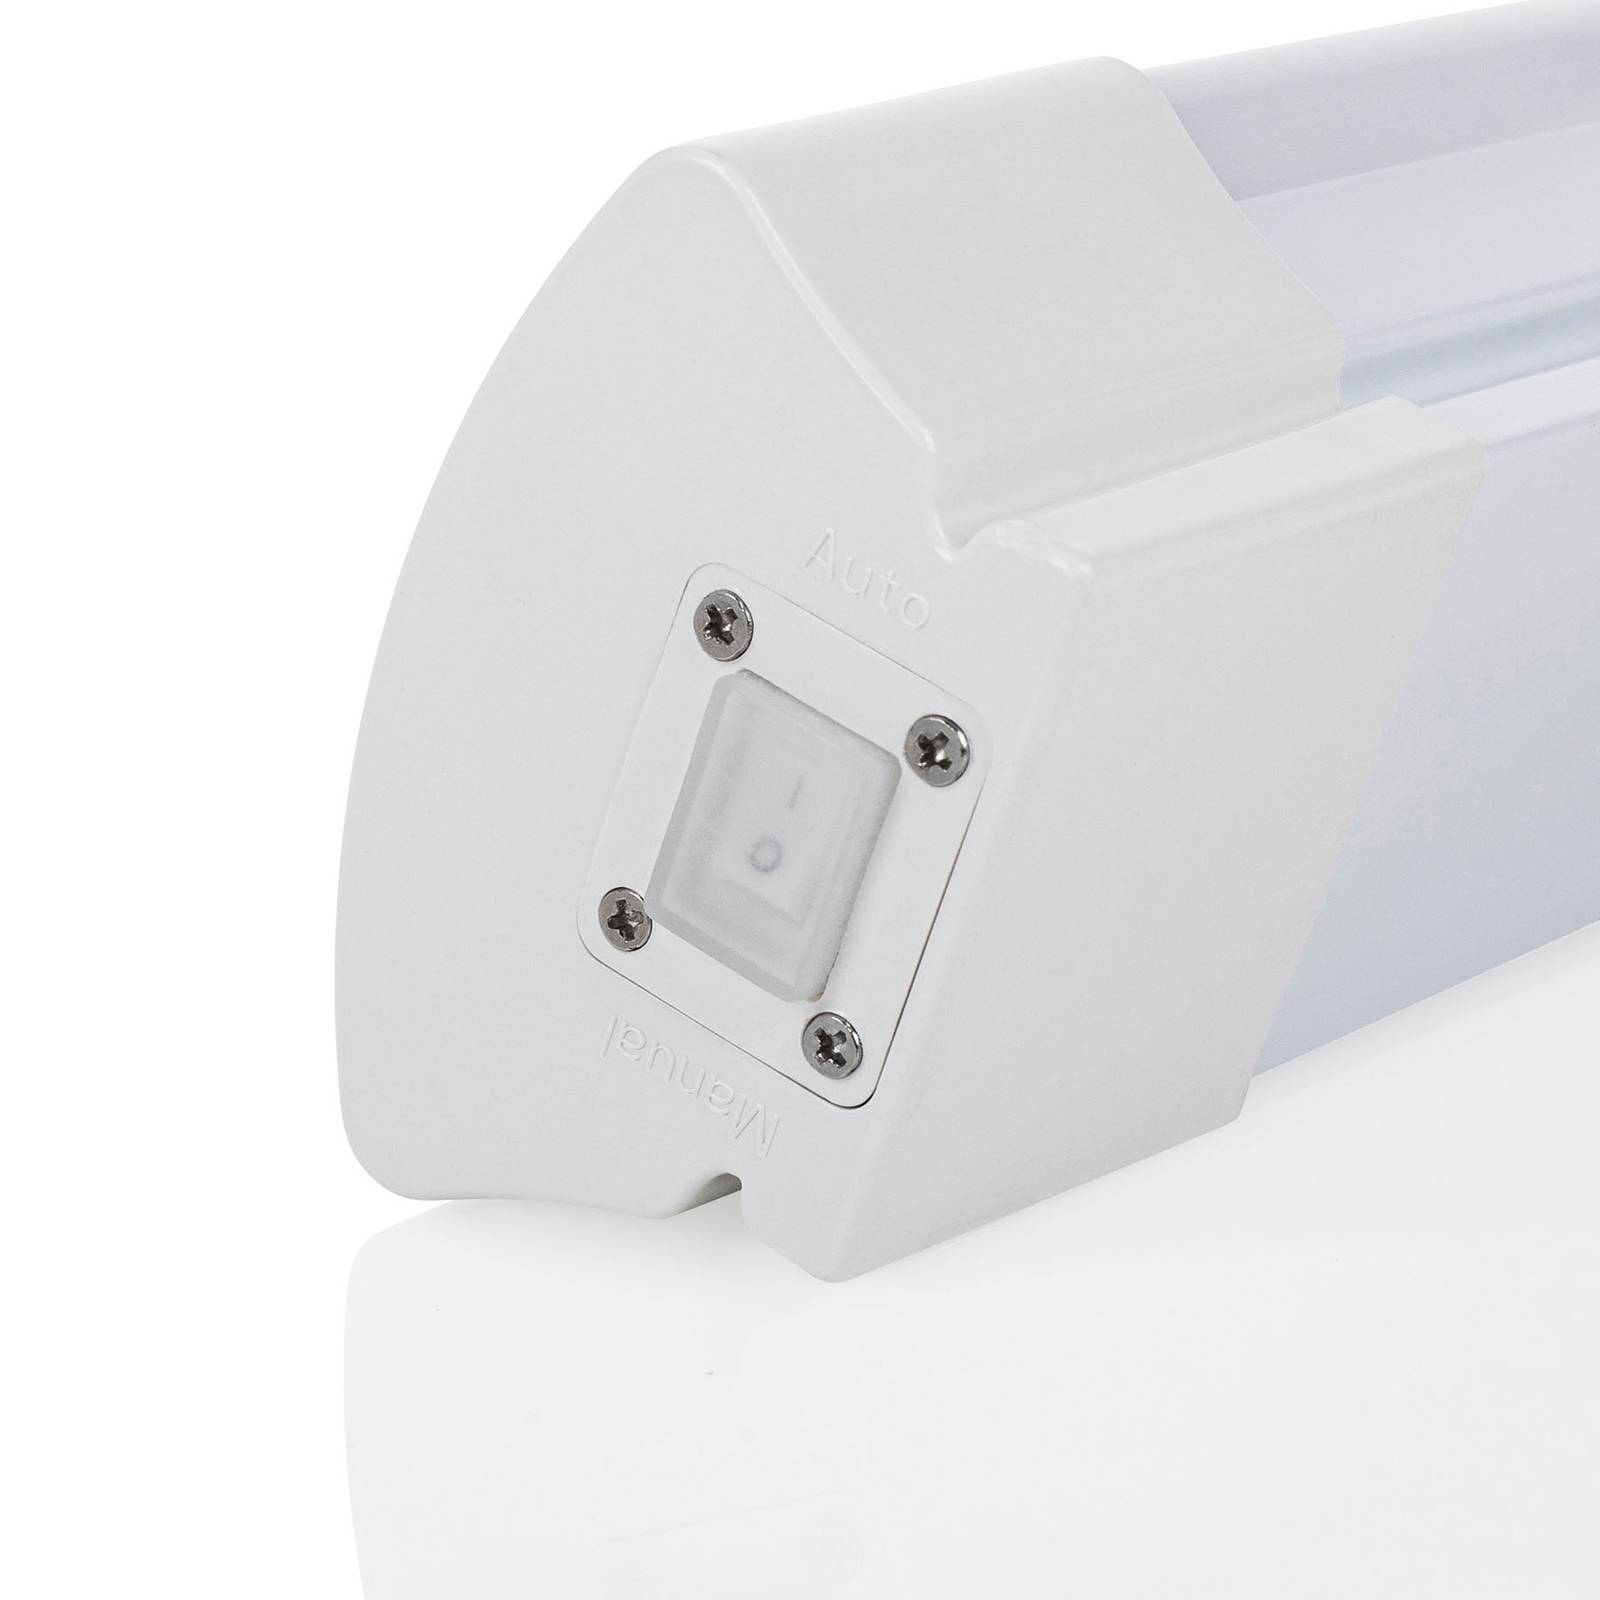 LED plafondlamp IFL-70000 met bewegingsmelder